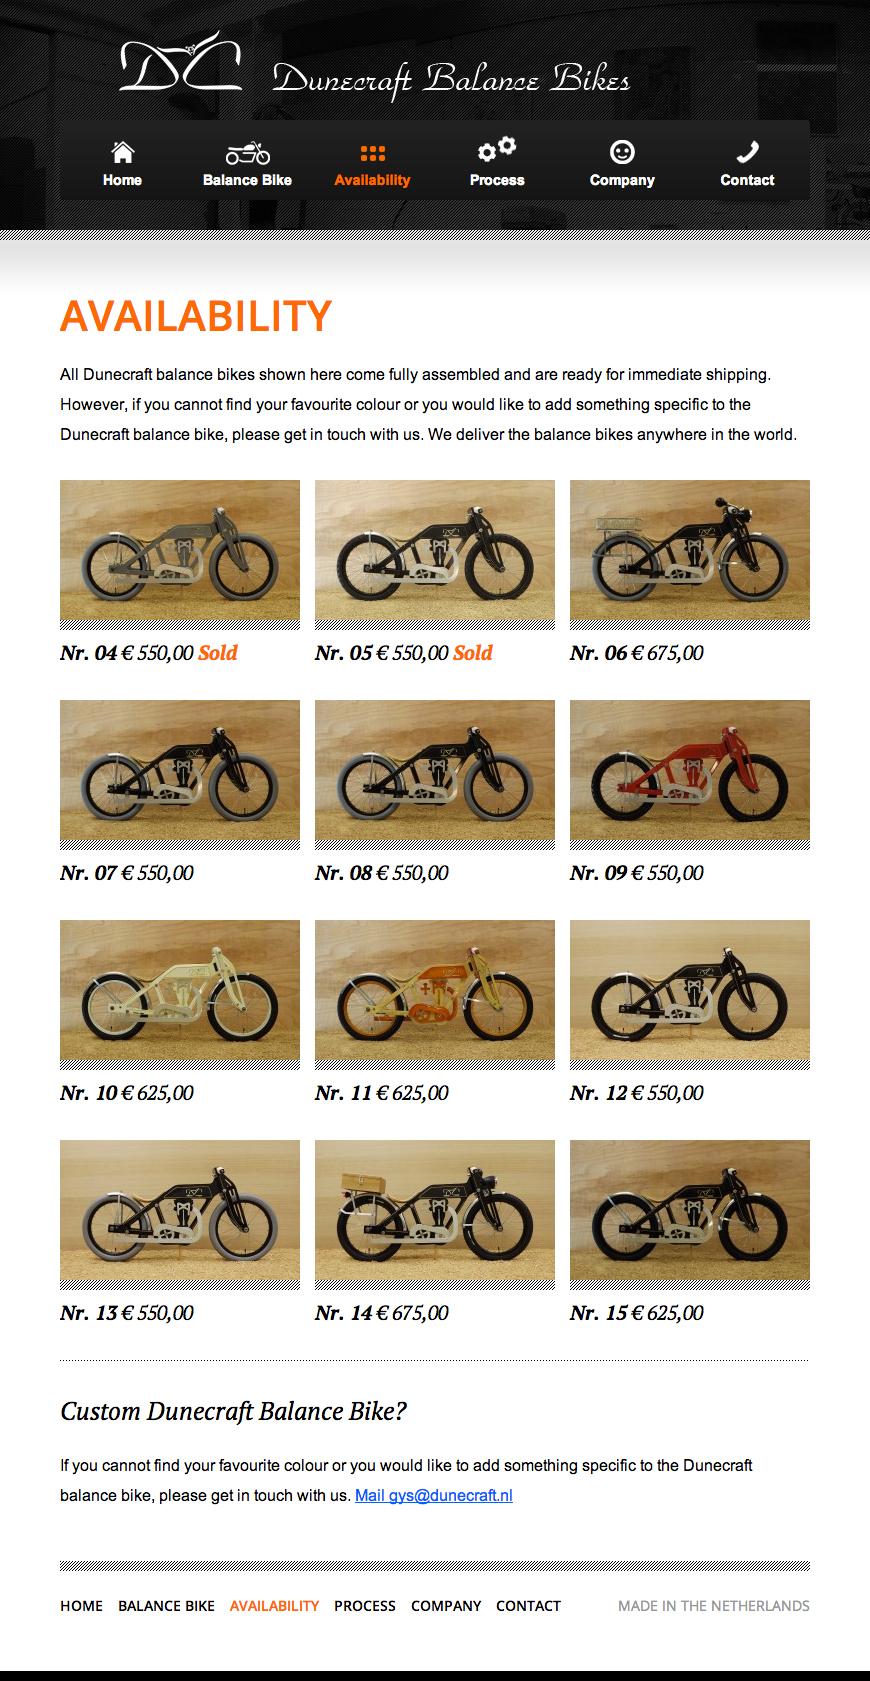 Dunecraft Balance Bikes Availability pagina